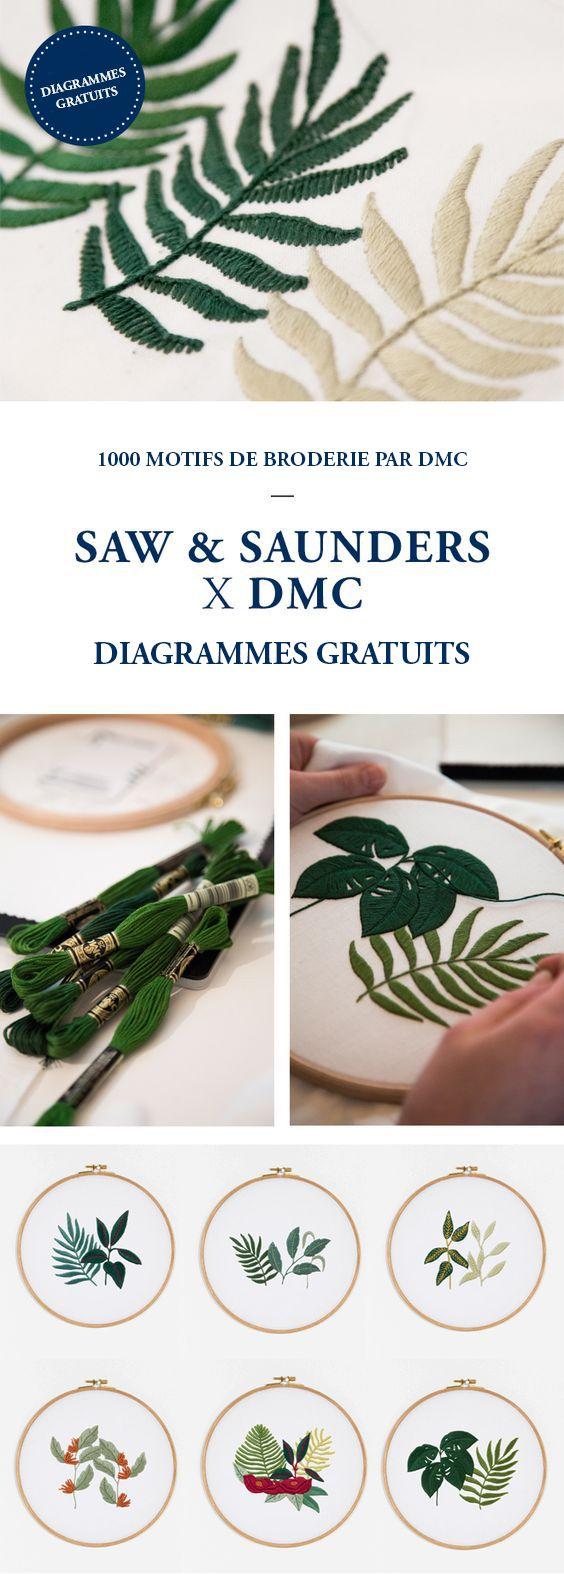 DIAGRAMMES GRATUITS - SAW & SAUNDERS X DMC